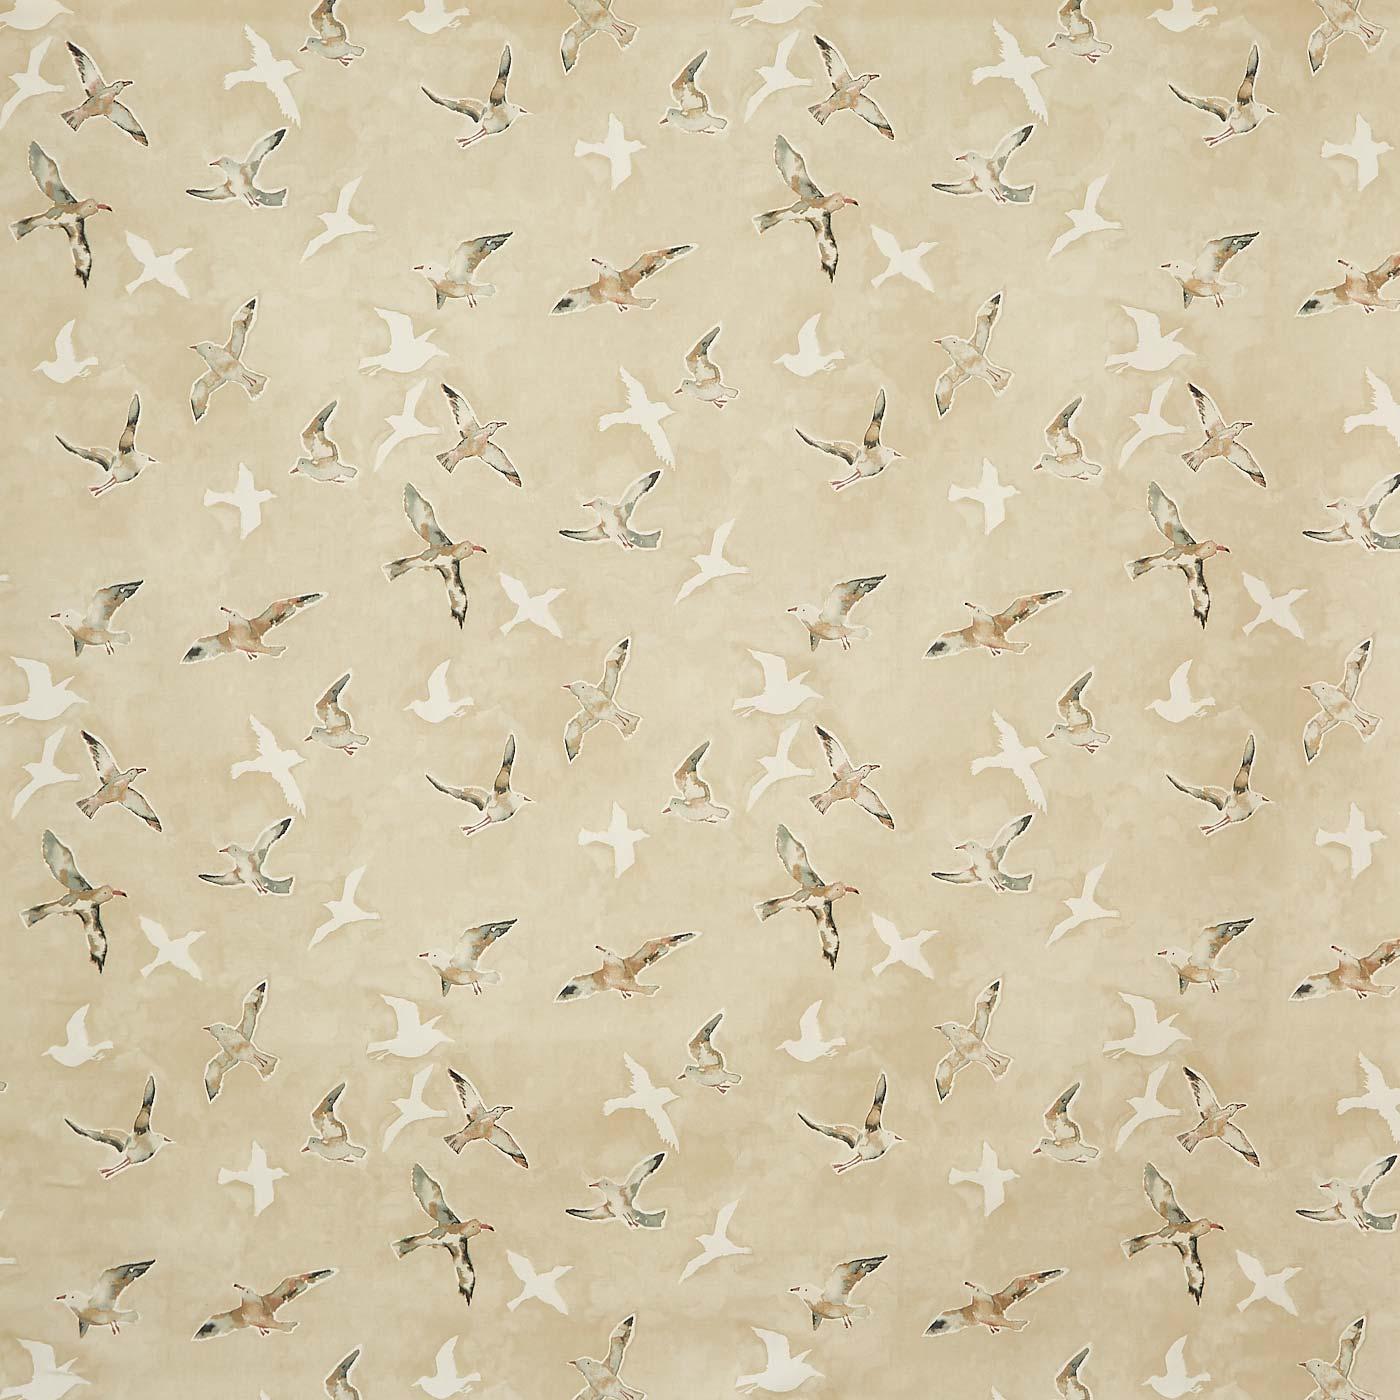 Seagulls Sand